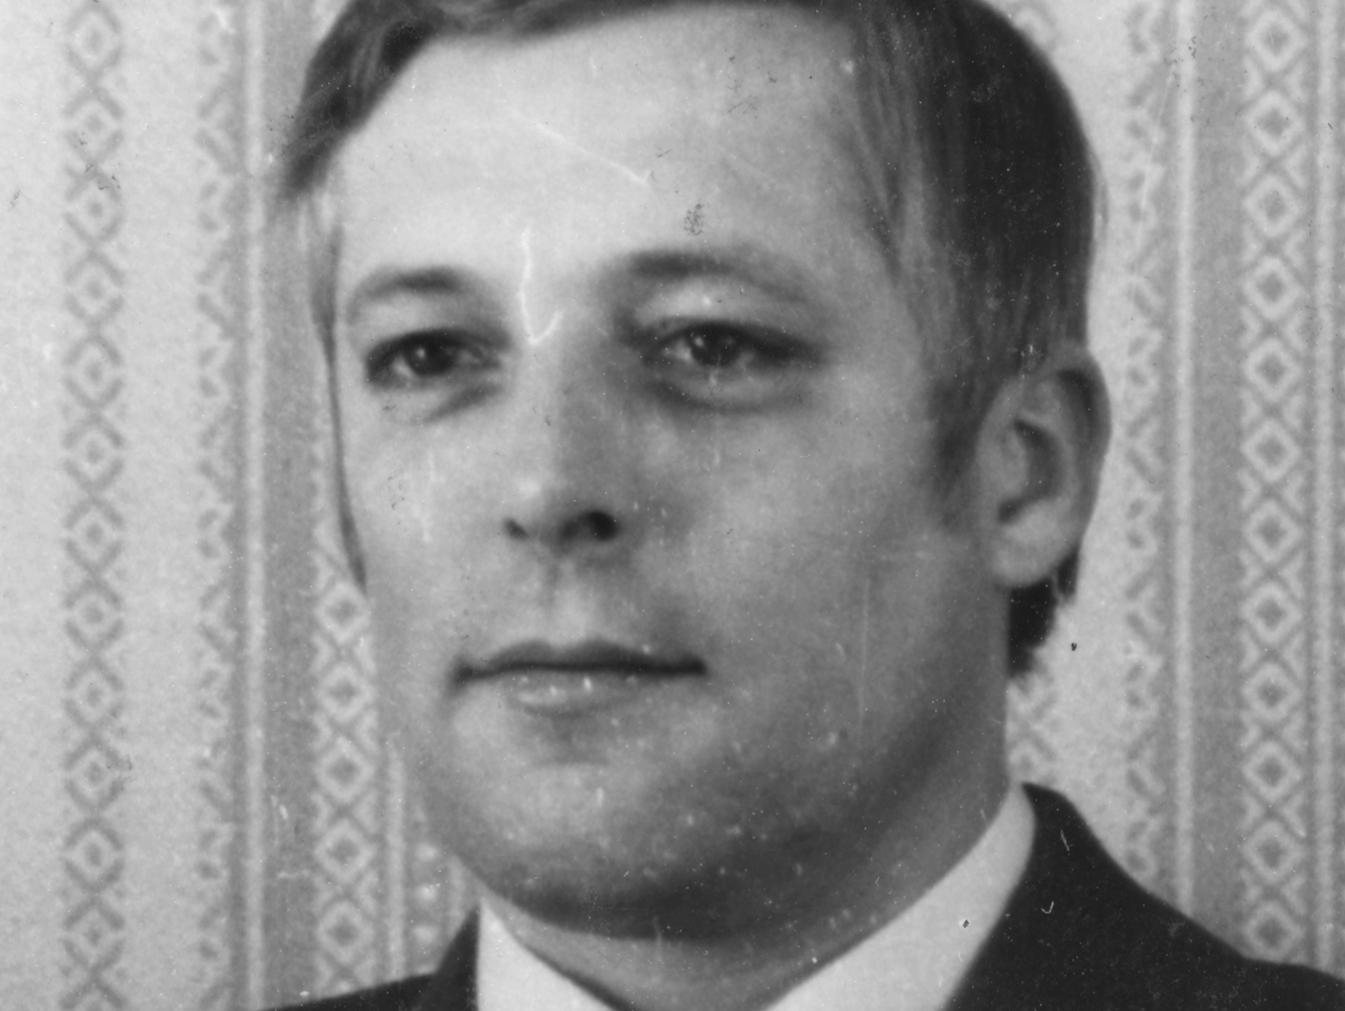 Passbild Horst Böhm